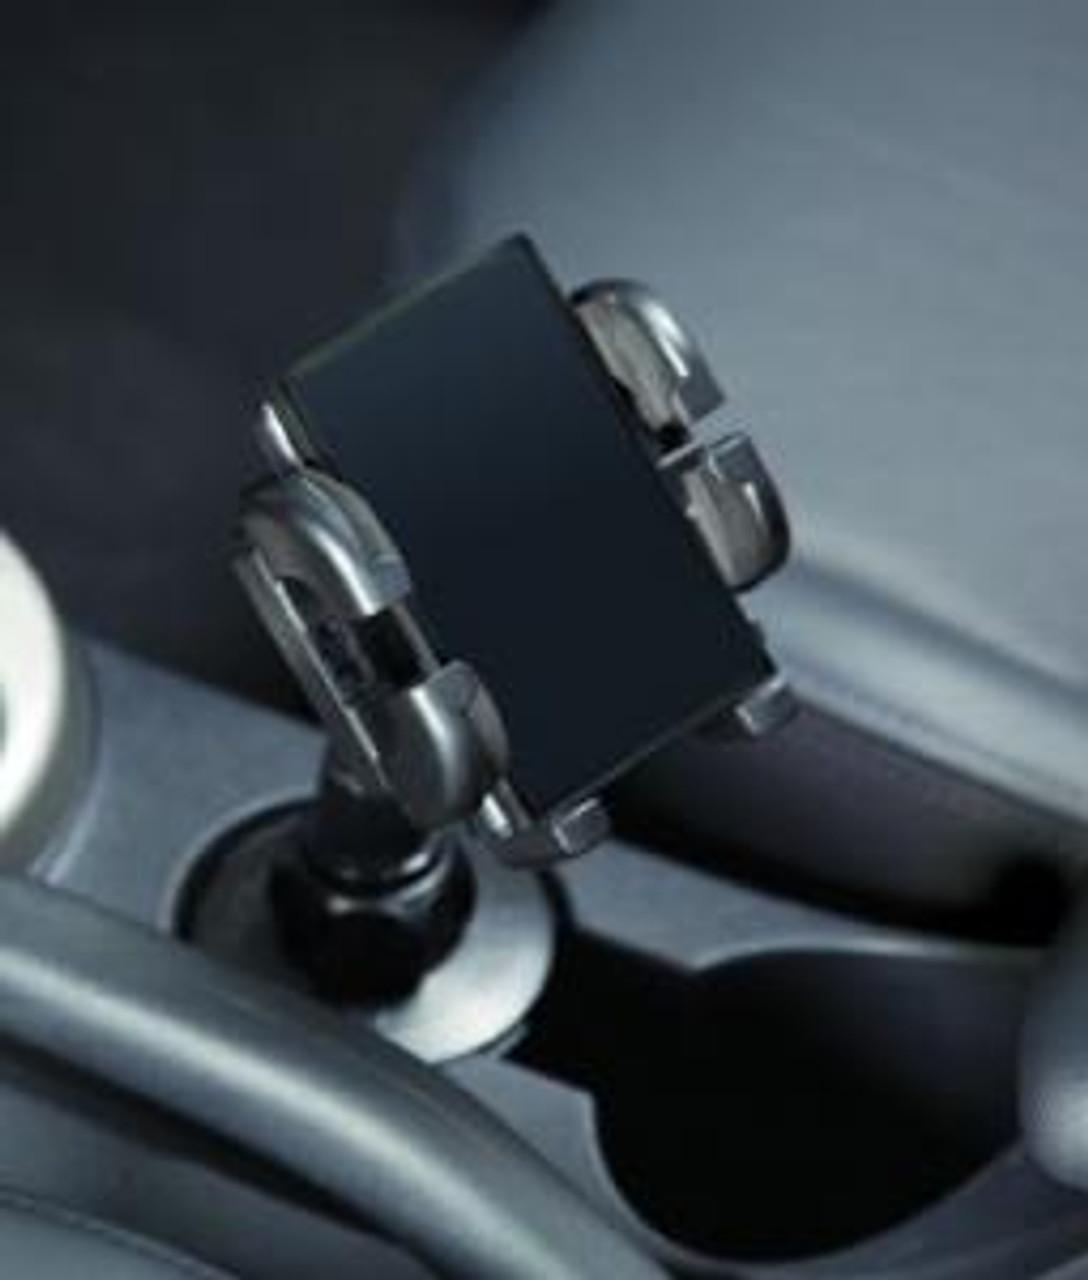 Kia Universal Cup Electronics Holder (A021)